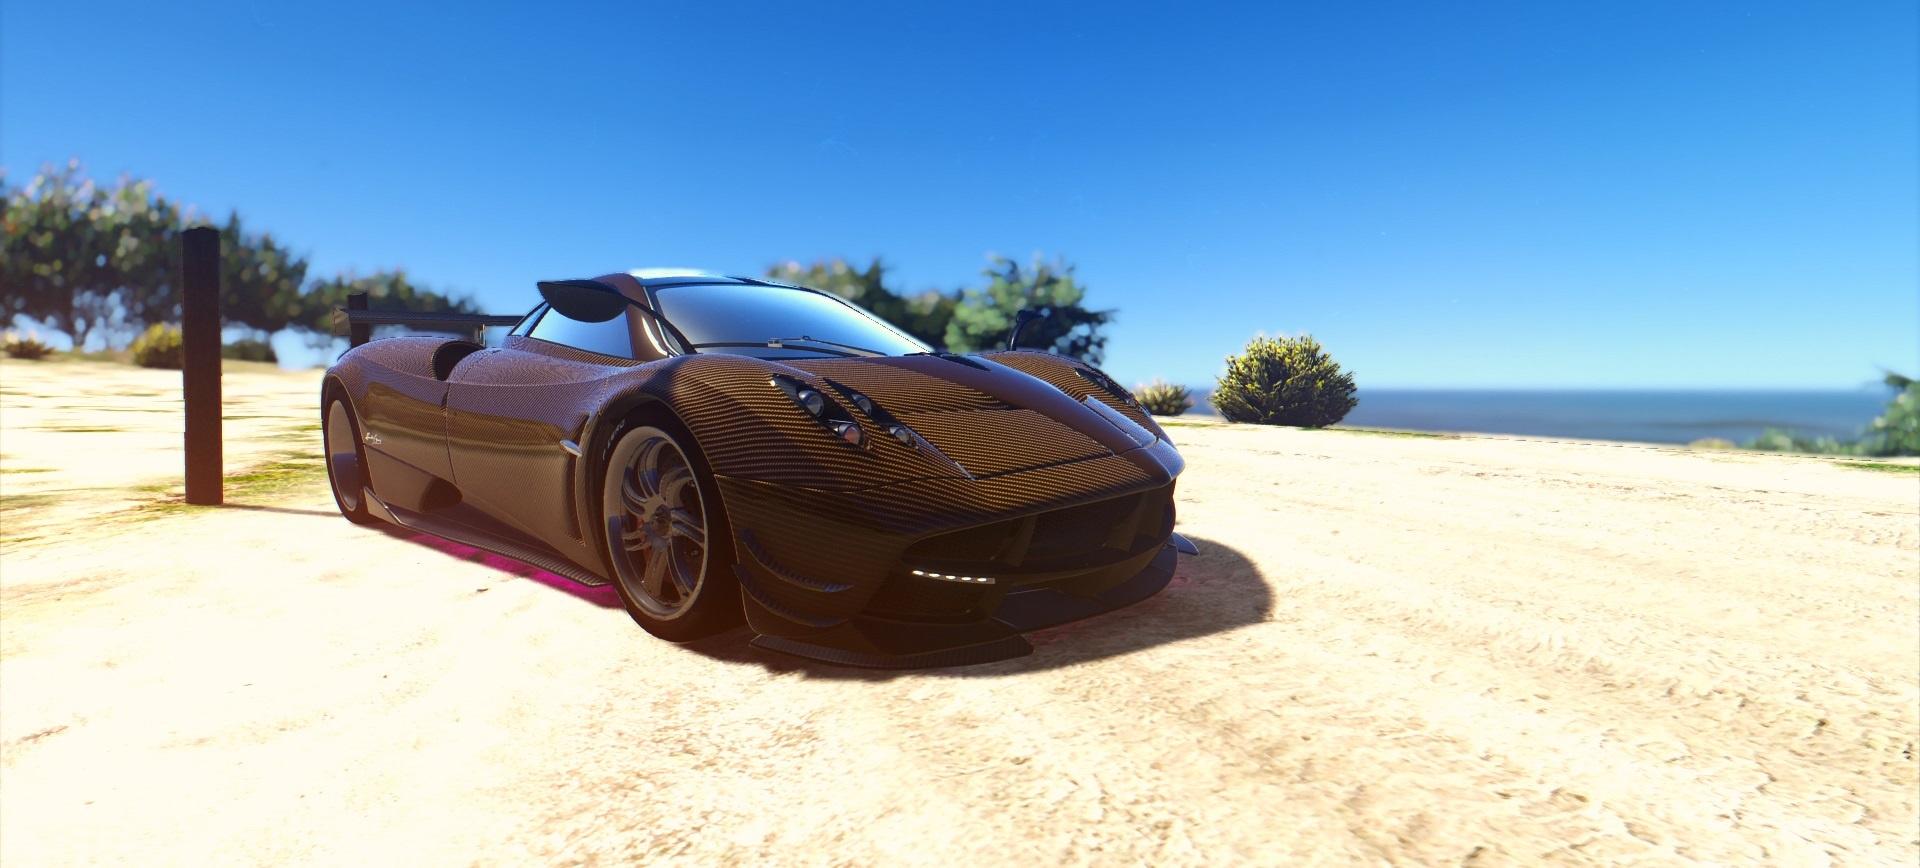 Pagani Huayra Brown Carbon Fiber Livery Gta5 Mods Com